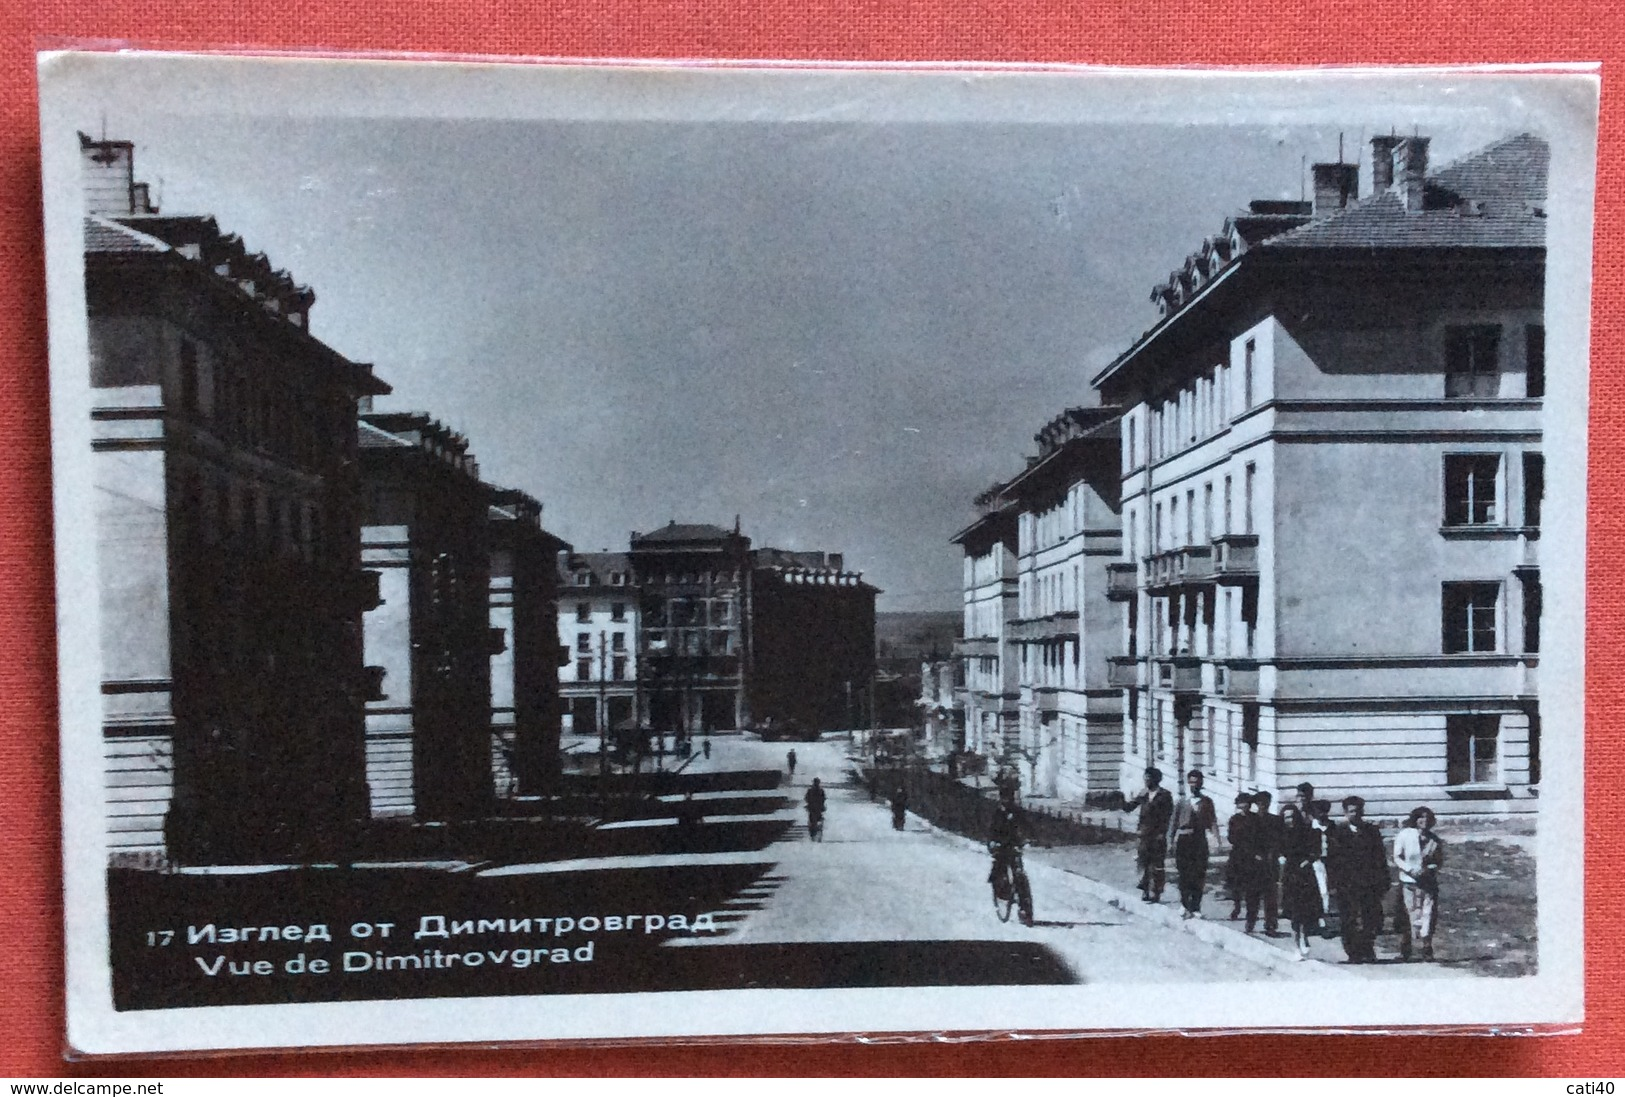 BULGARIA VUE DE DIMITROVGRAD - Bulgaria